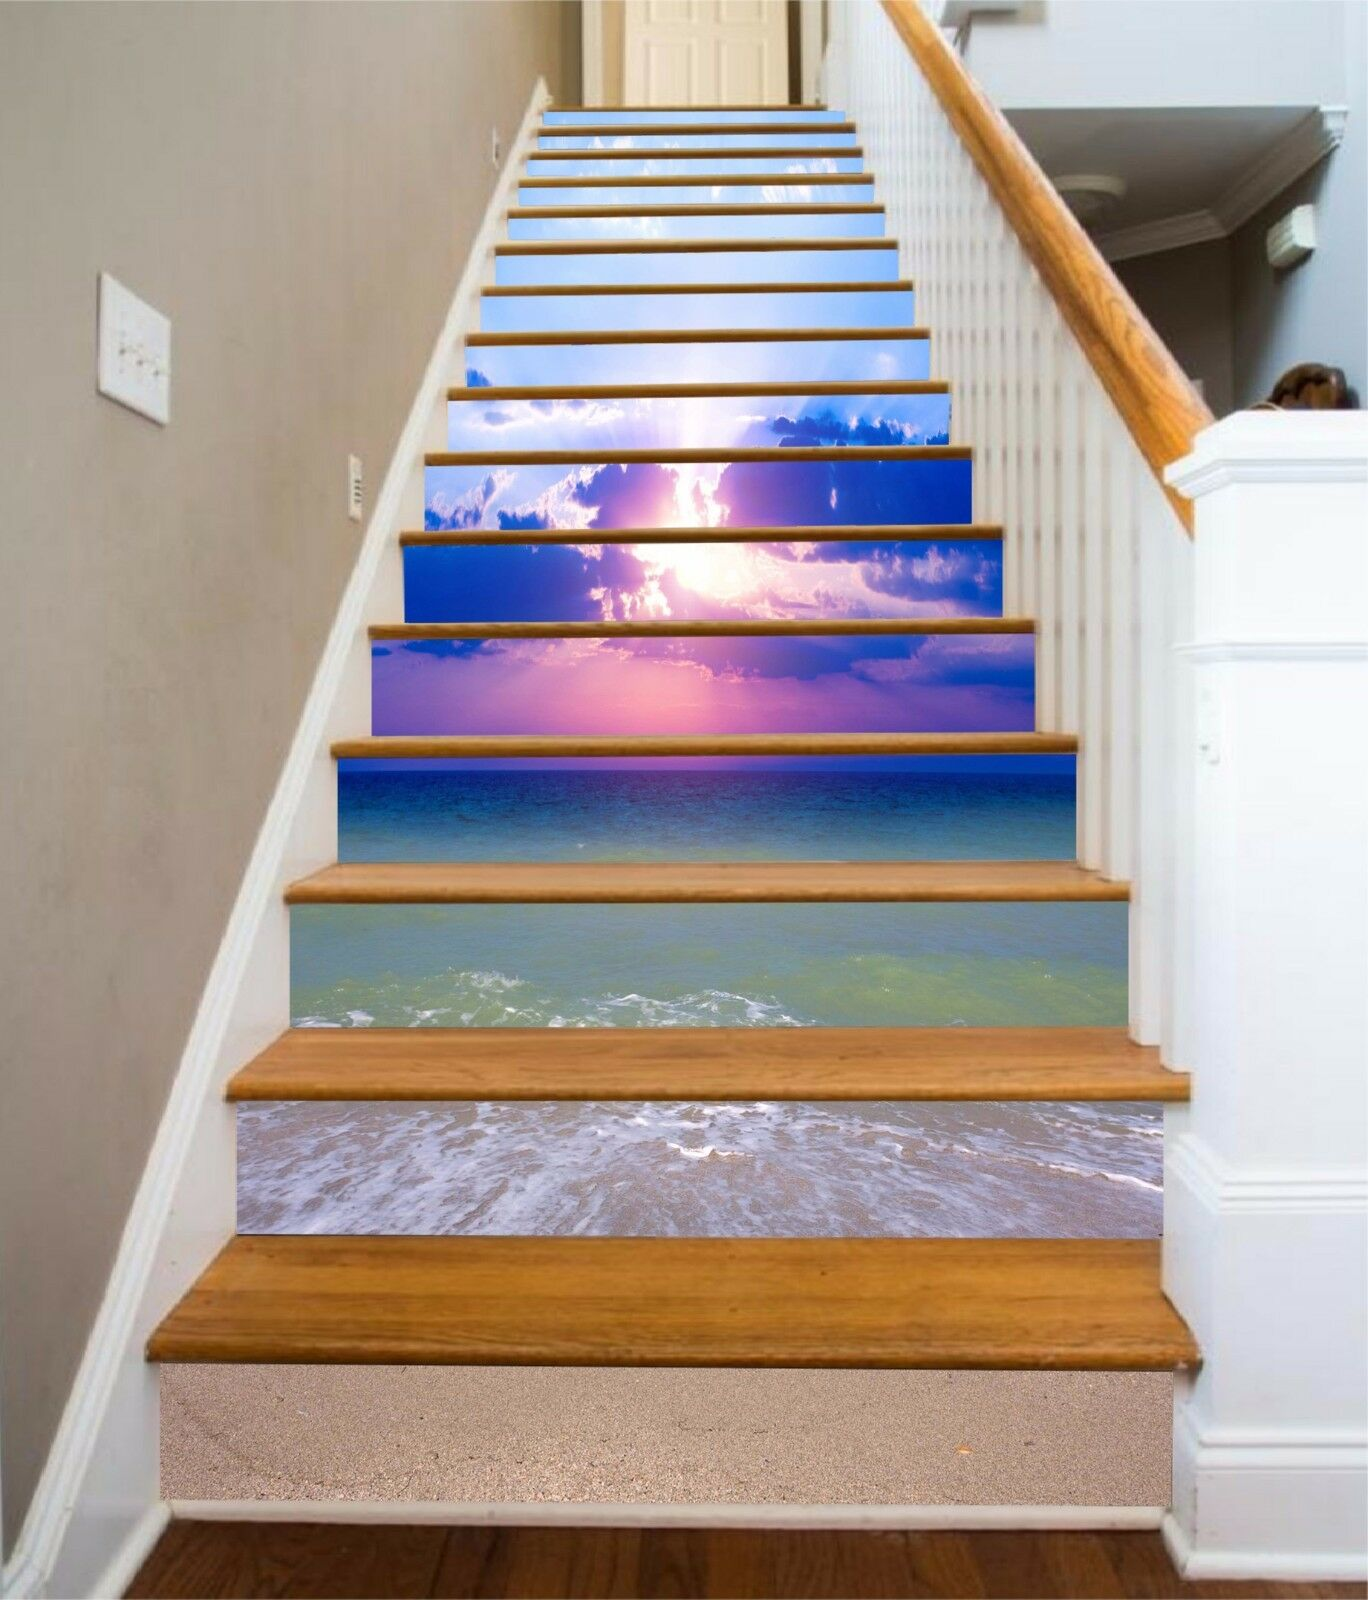 3D Sun Seaside 749 Stair Risers Decoration Photo Mural Vinyl Decal Wallpaper AU